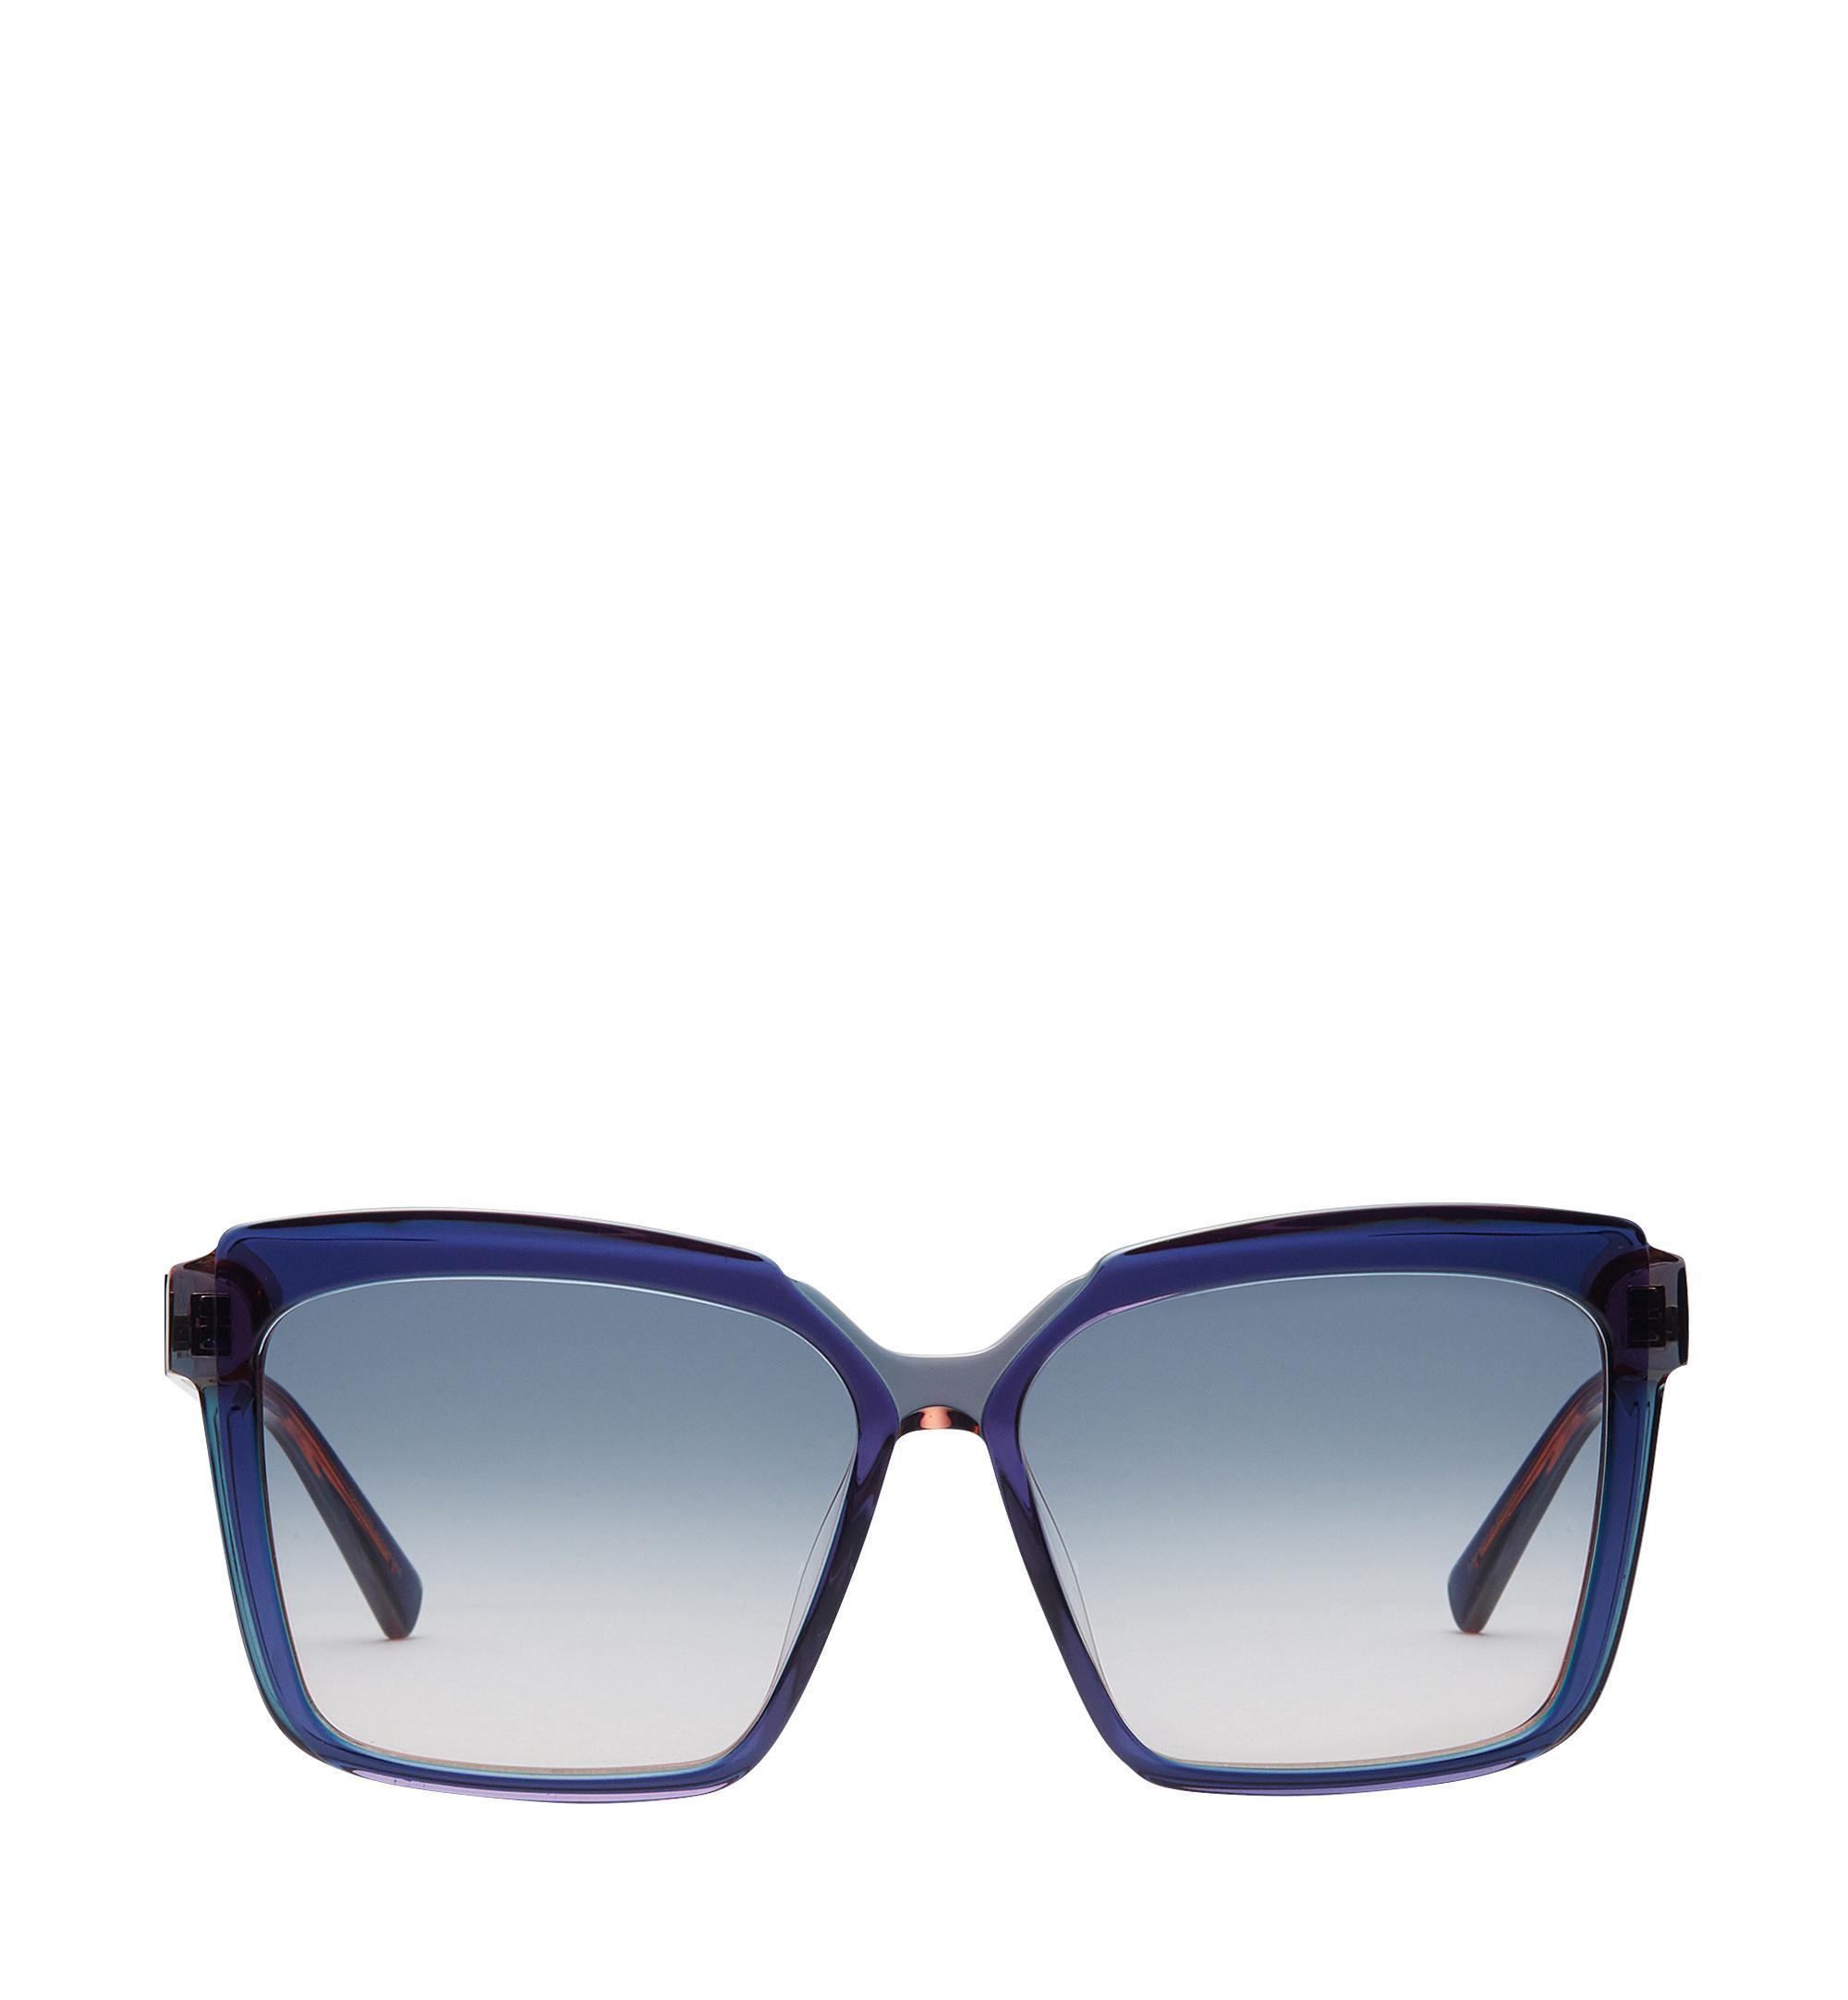 Mcm Square Oversized Sunglasses In Ls